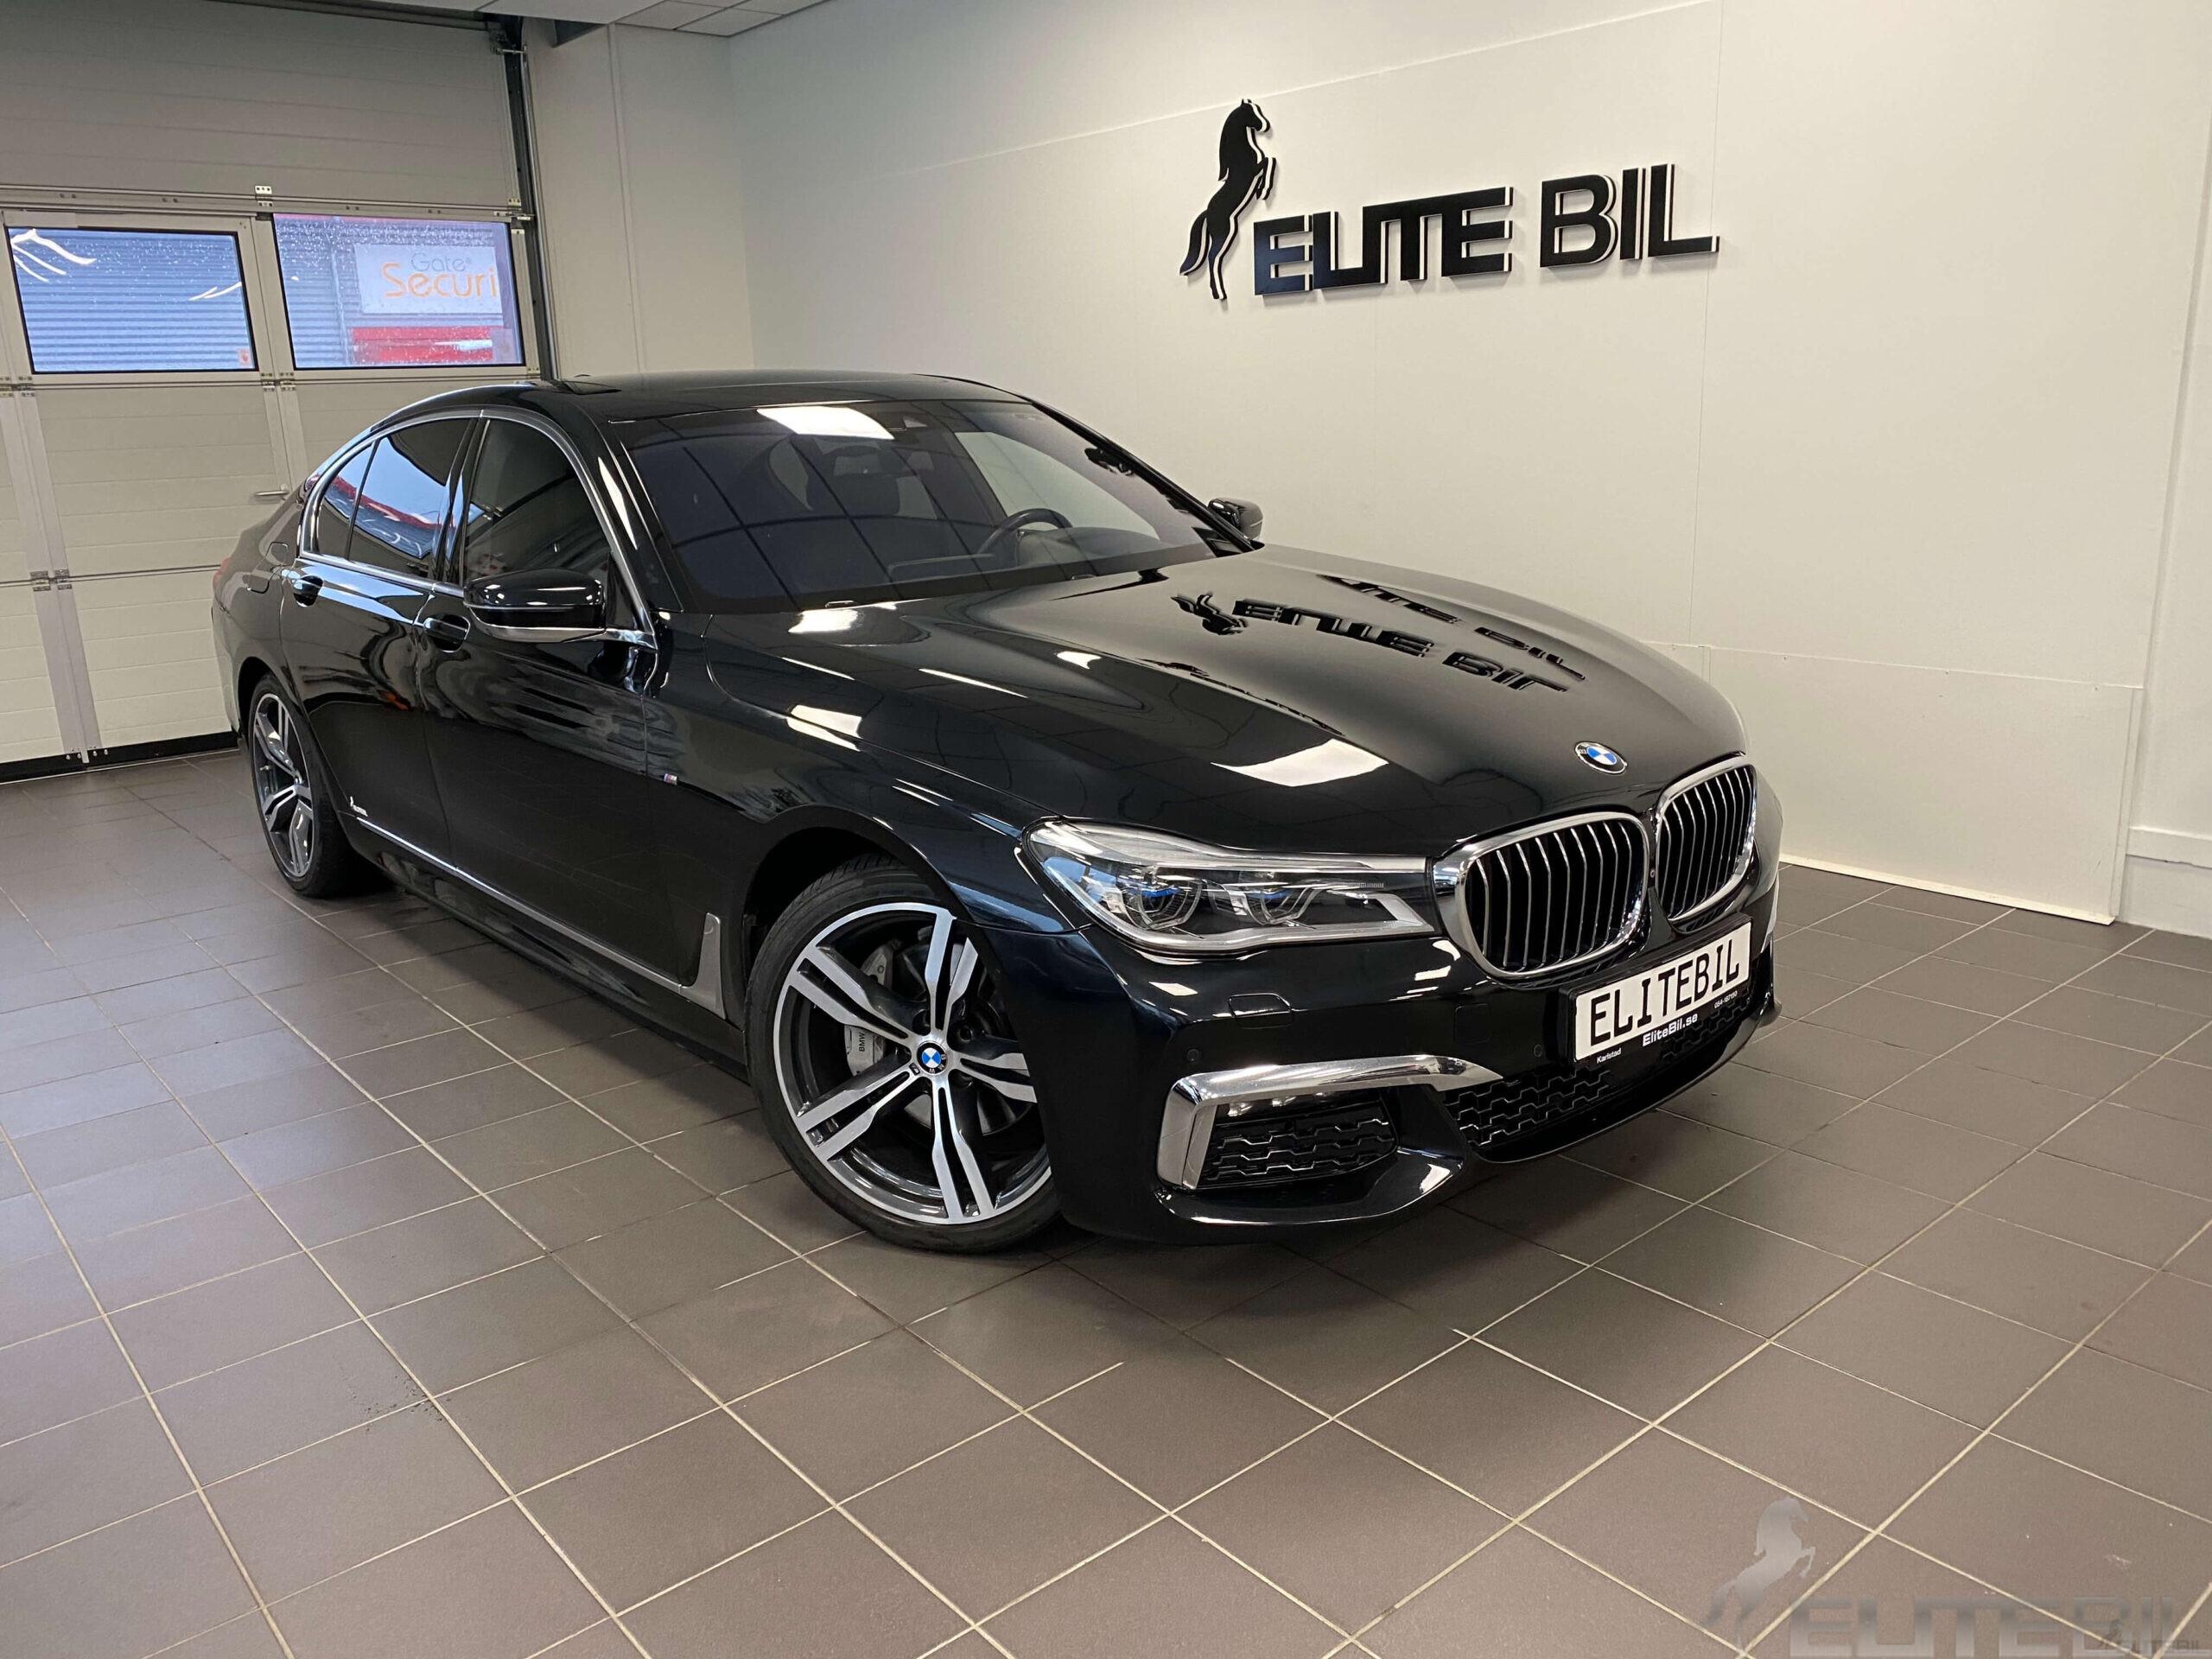 BMW 730 D xDrive M-Sport Executive /Innovation pkt Bör Ses